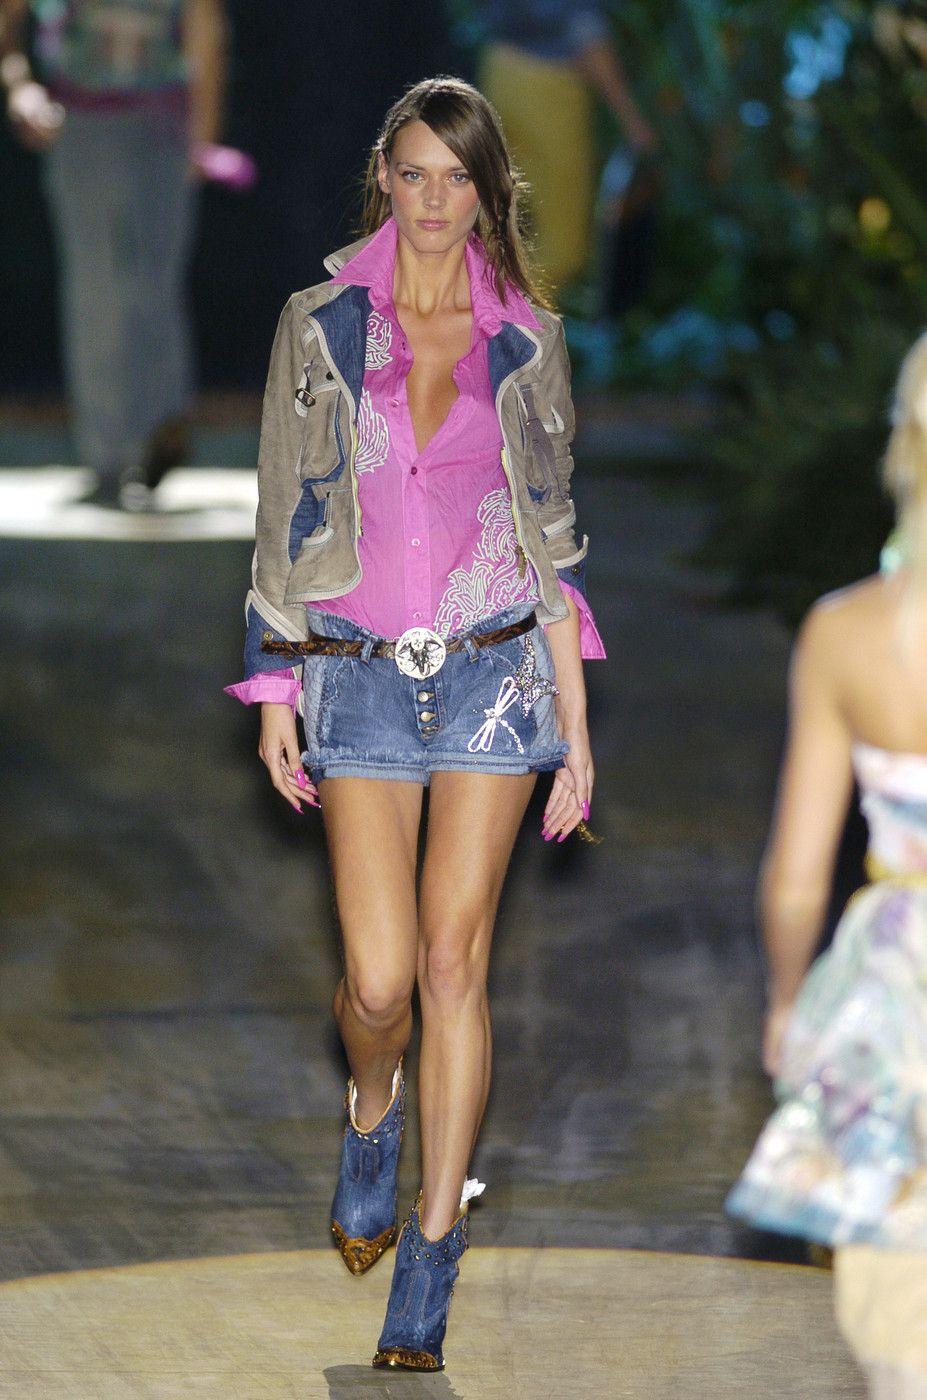 http://www.stylebistro.com/runway/Milan Fashion Week Spring 2005/Just Cavalli/ZRbCHQmKFxM